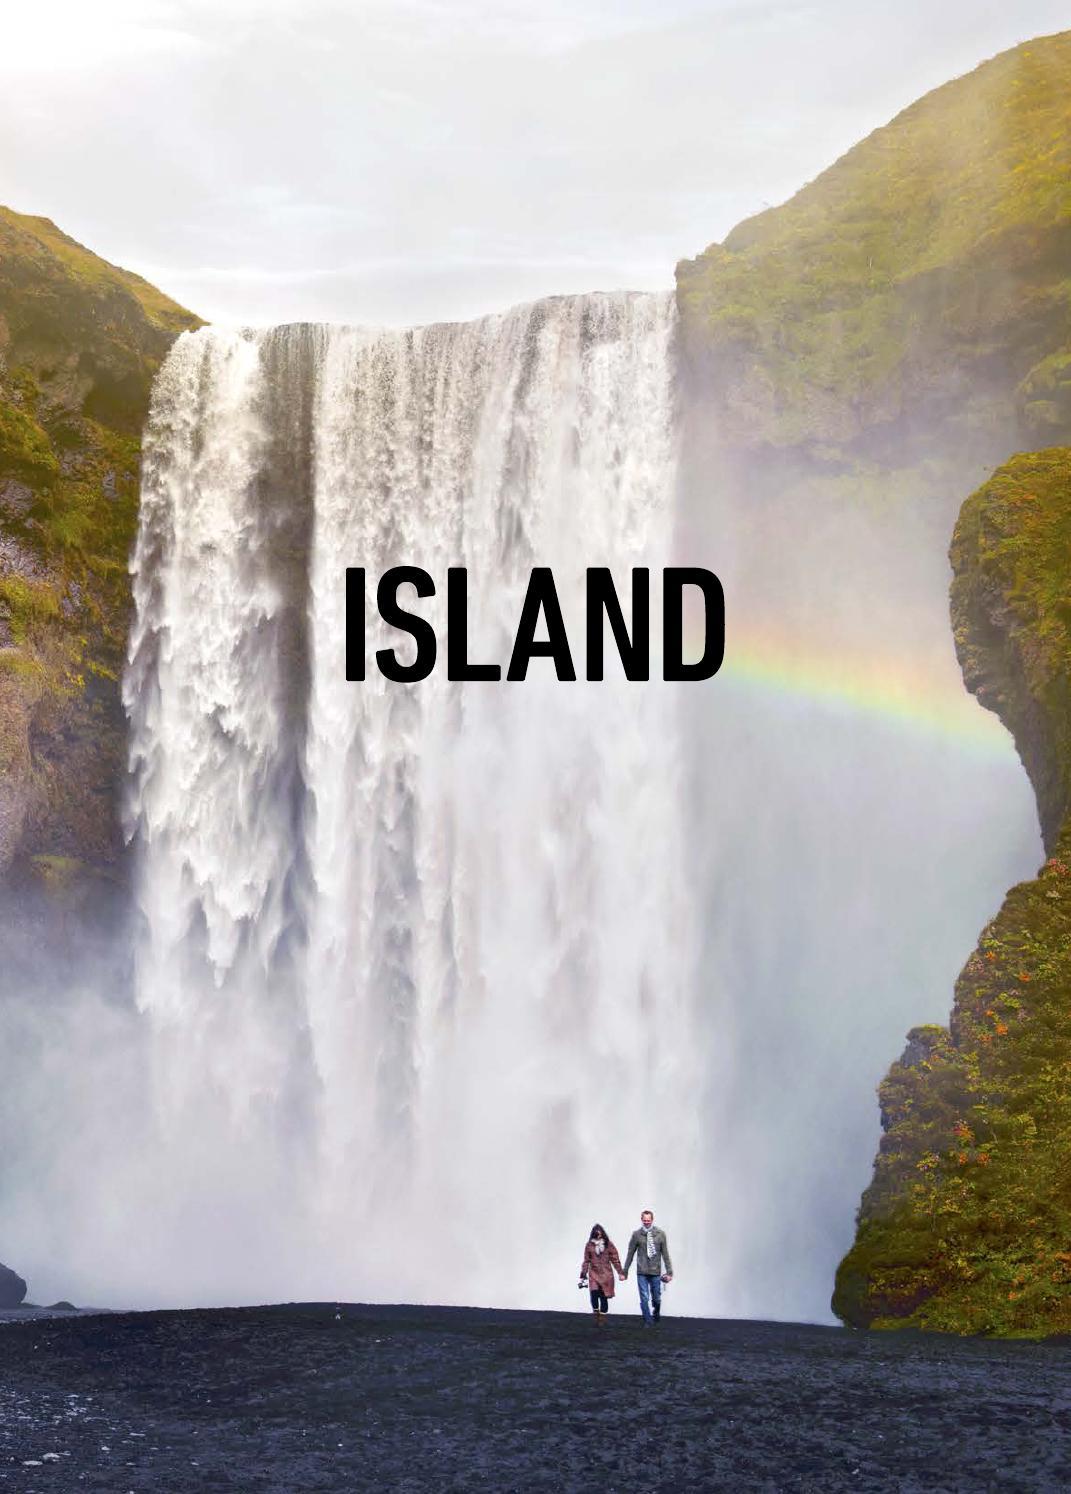 Iceland German May 2015 By Islandsstofa Promote Iceland Issuu